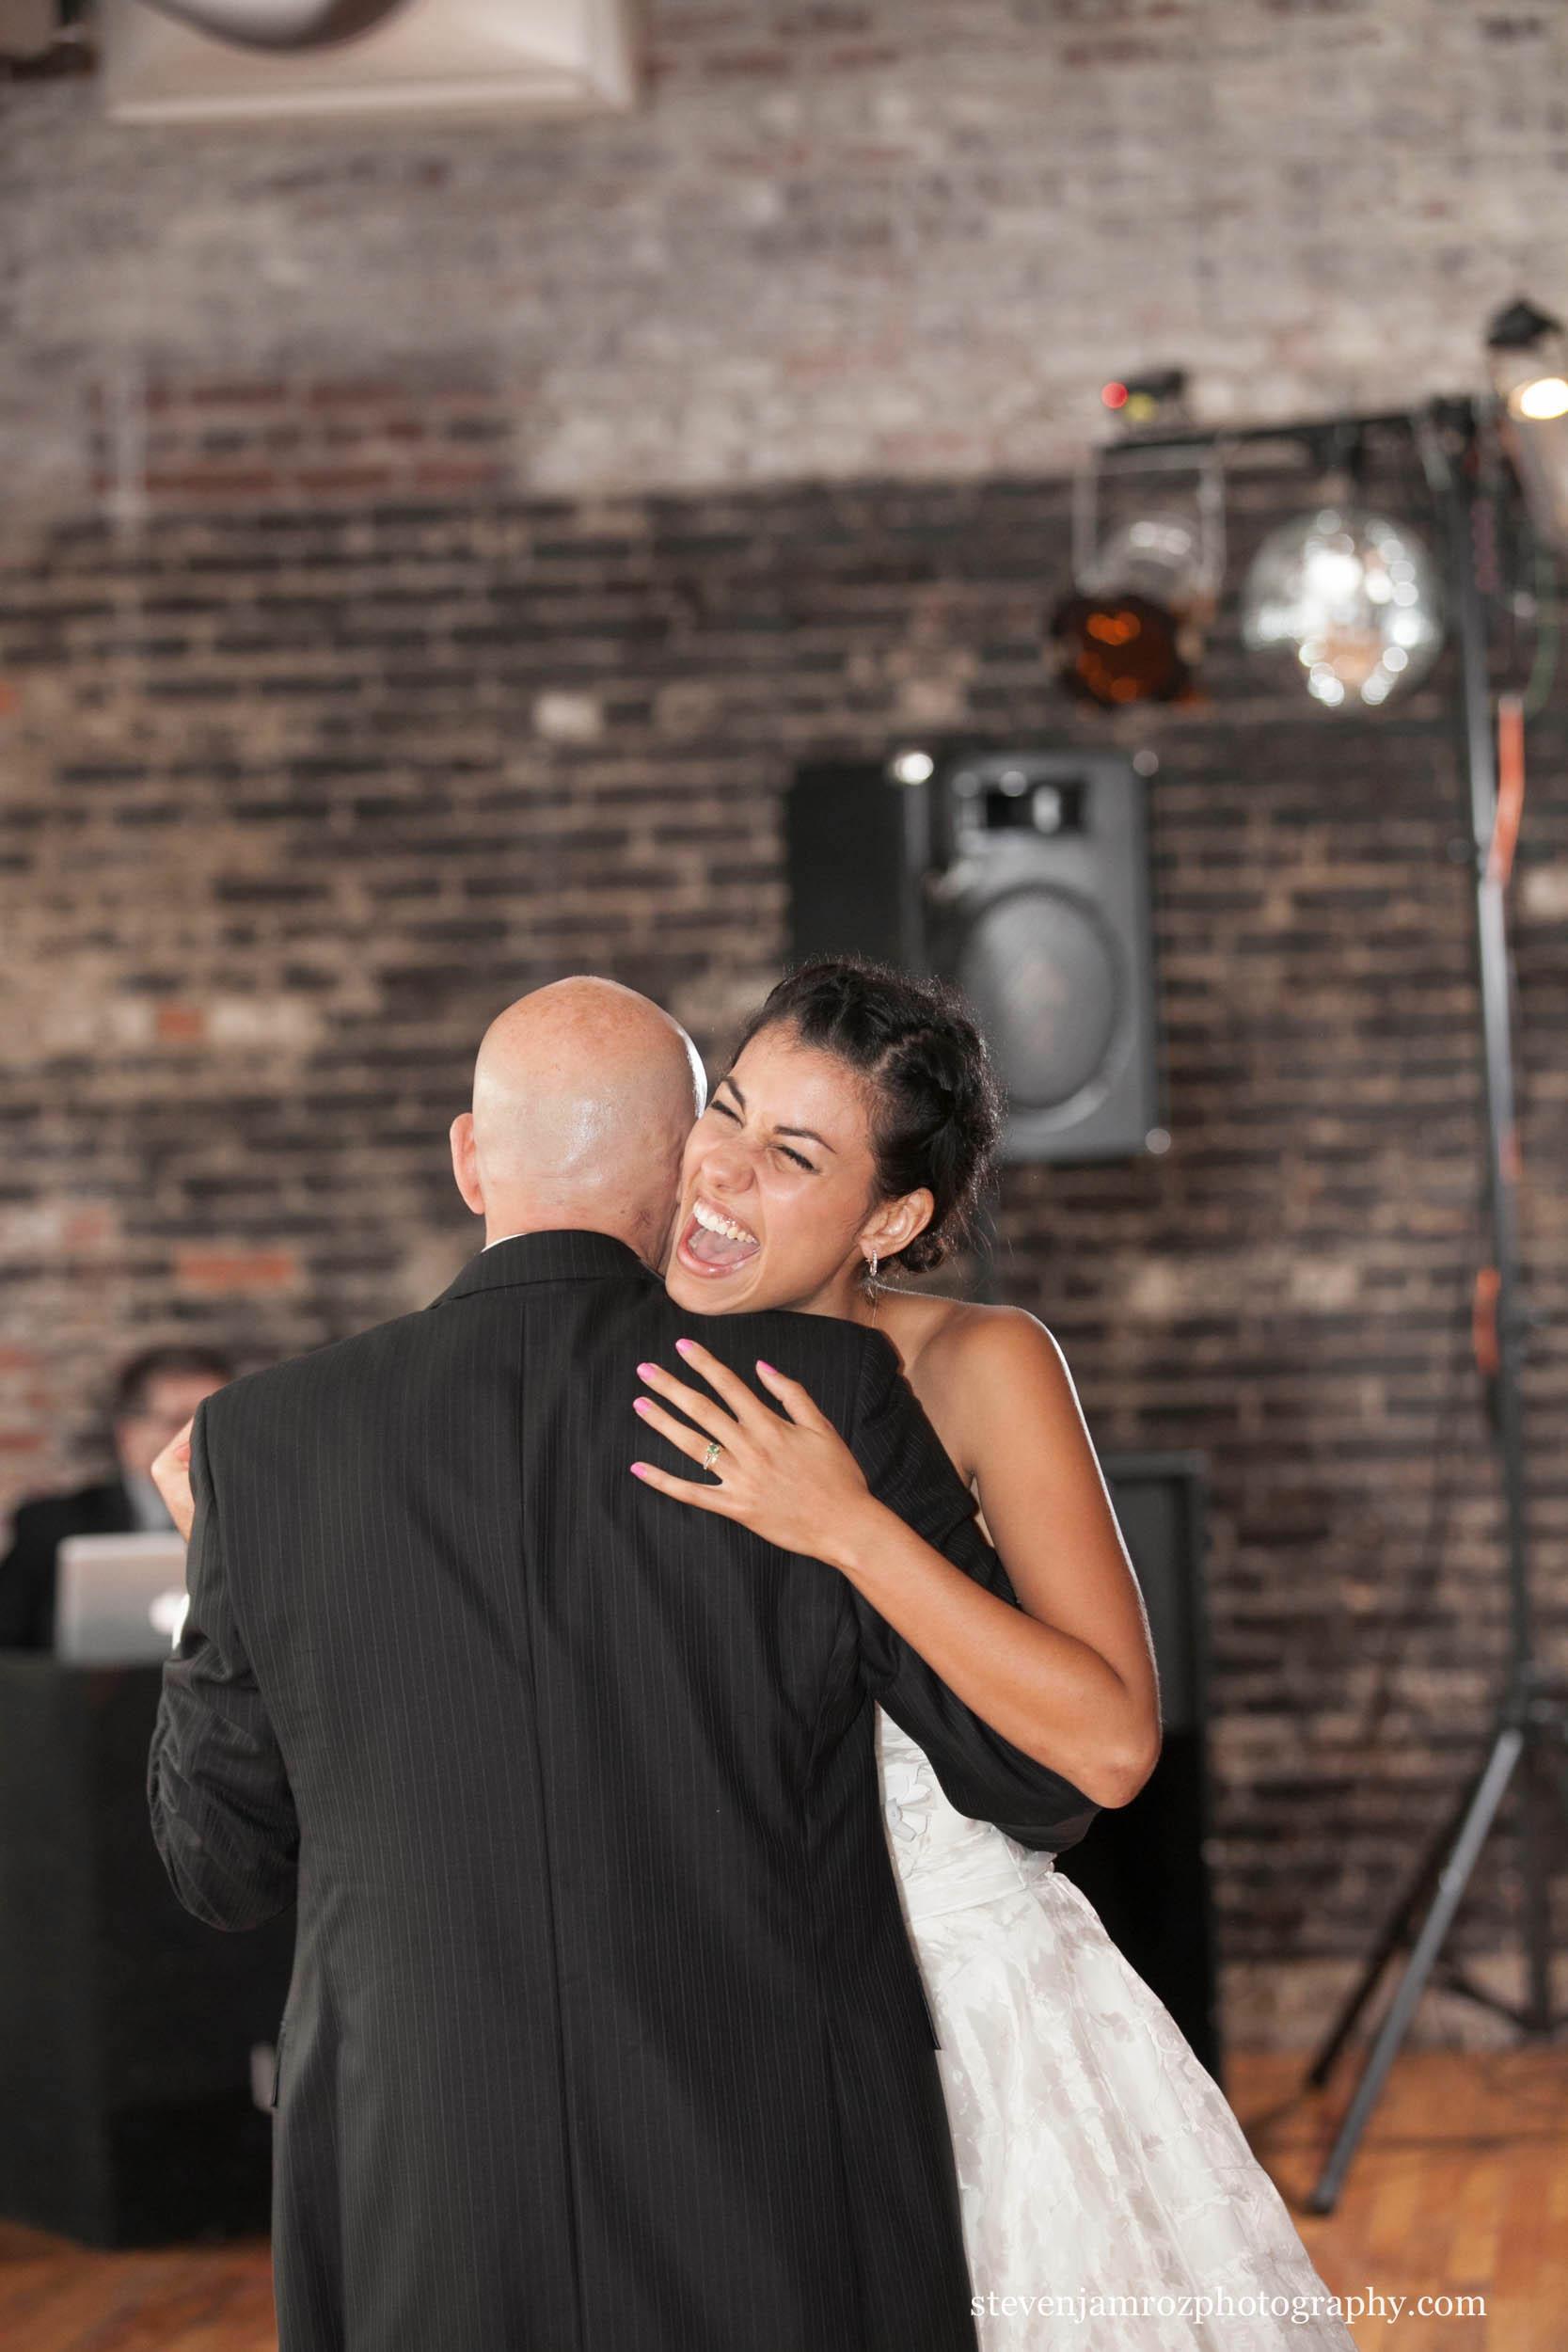 230-stockroom-first-dance-photography-0935.jpg